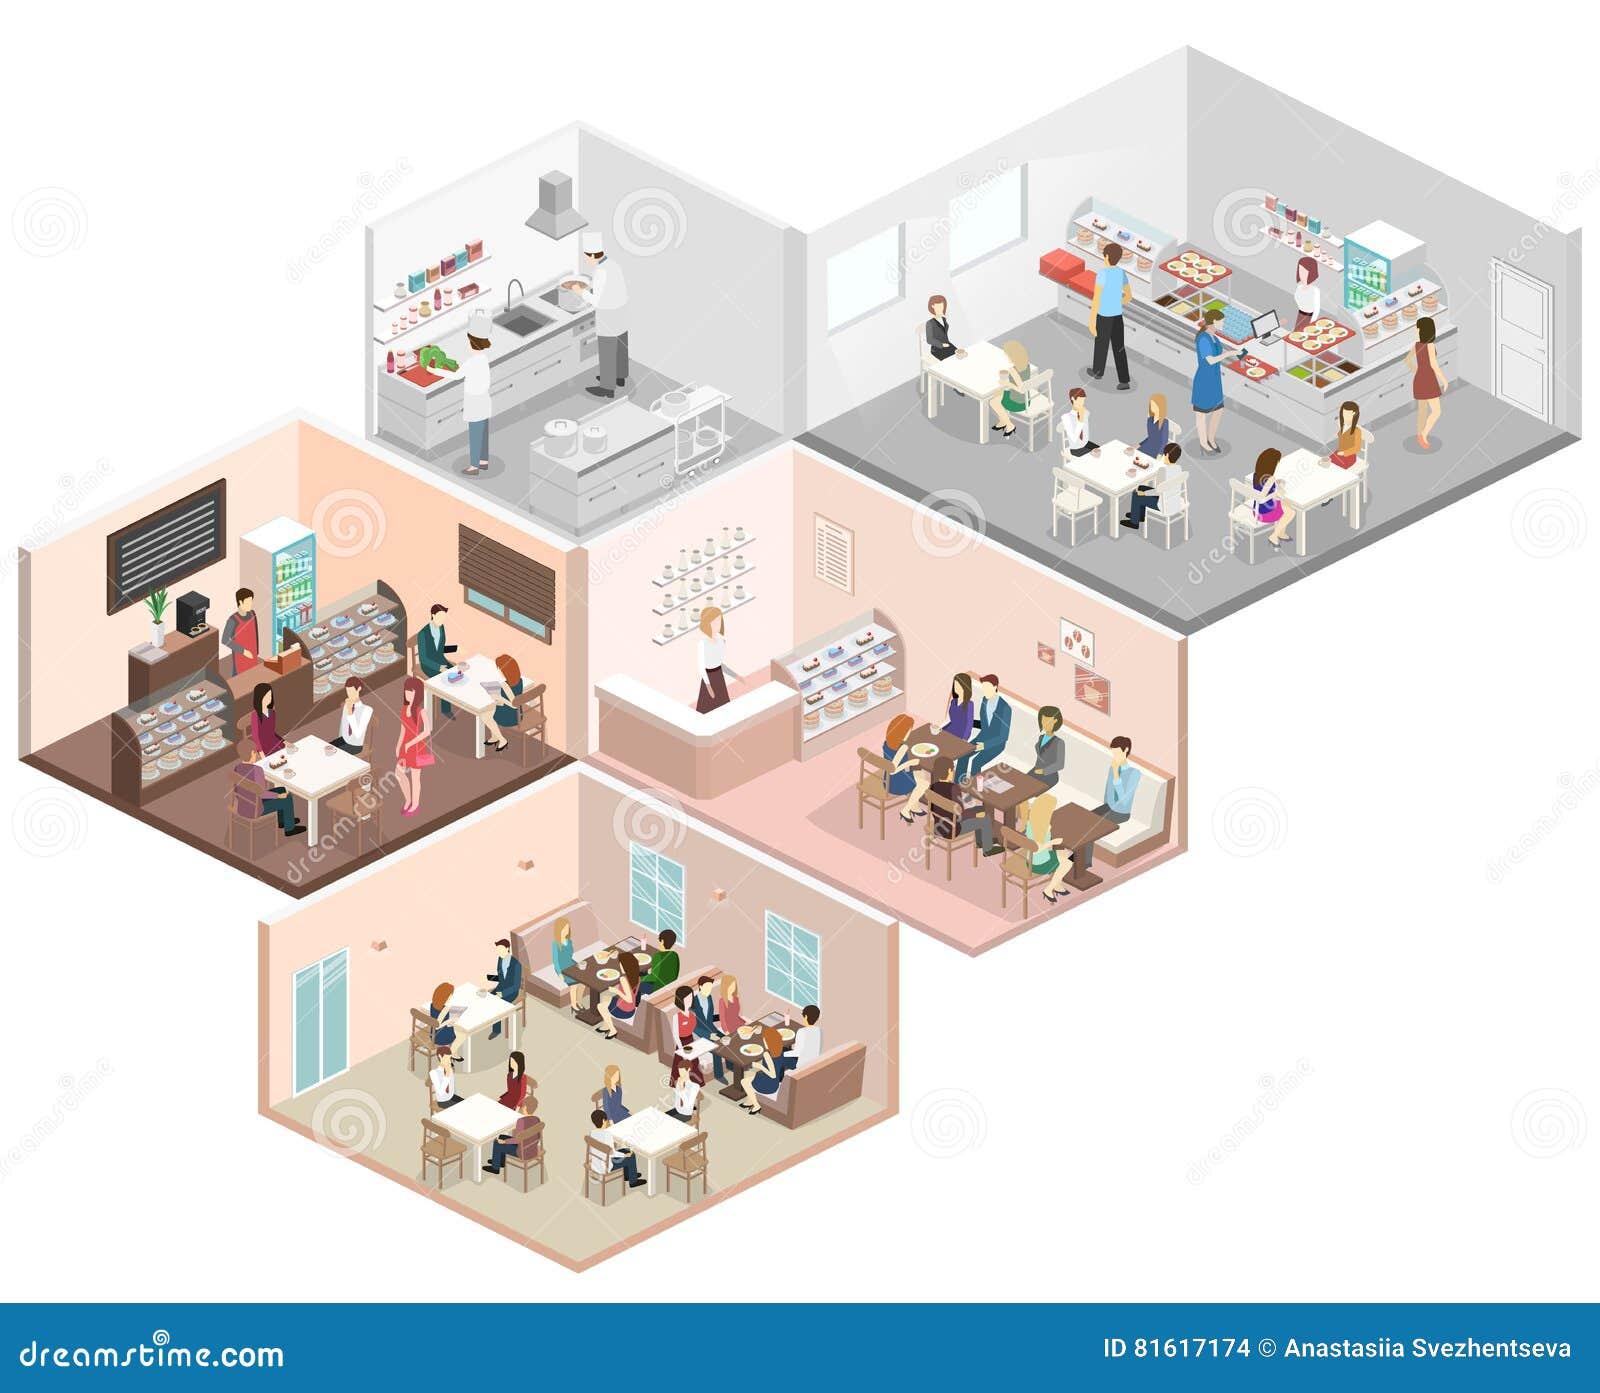 Caf interior del concepto plano isom trico 3d cantina for Planos de cocinas 3d